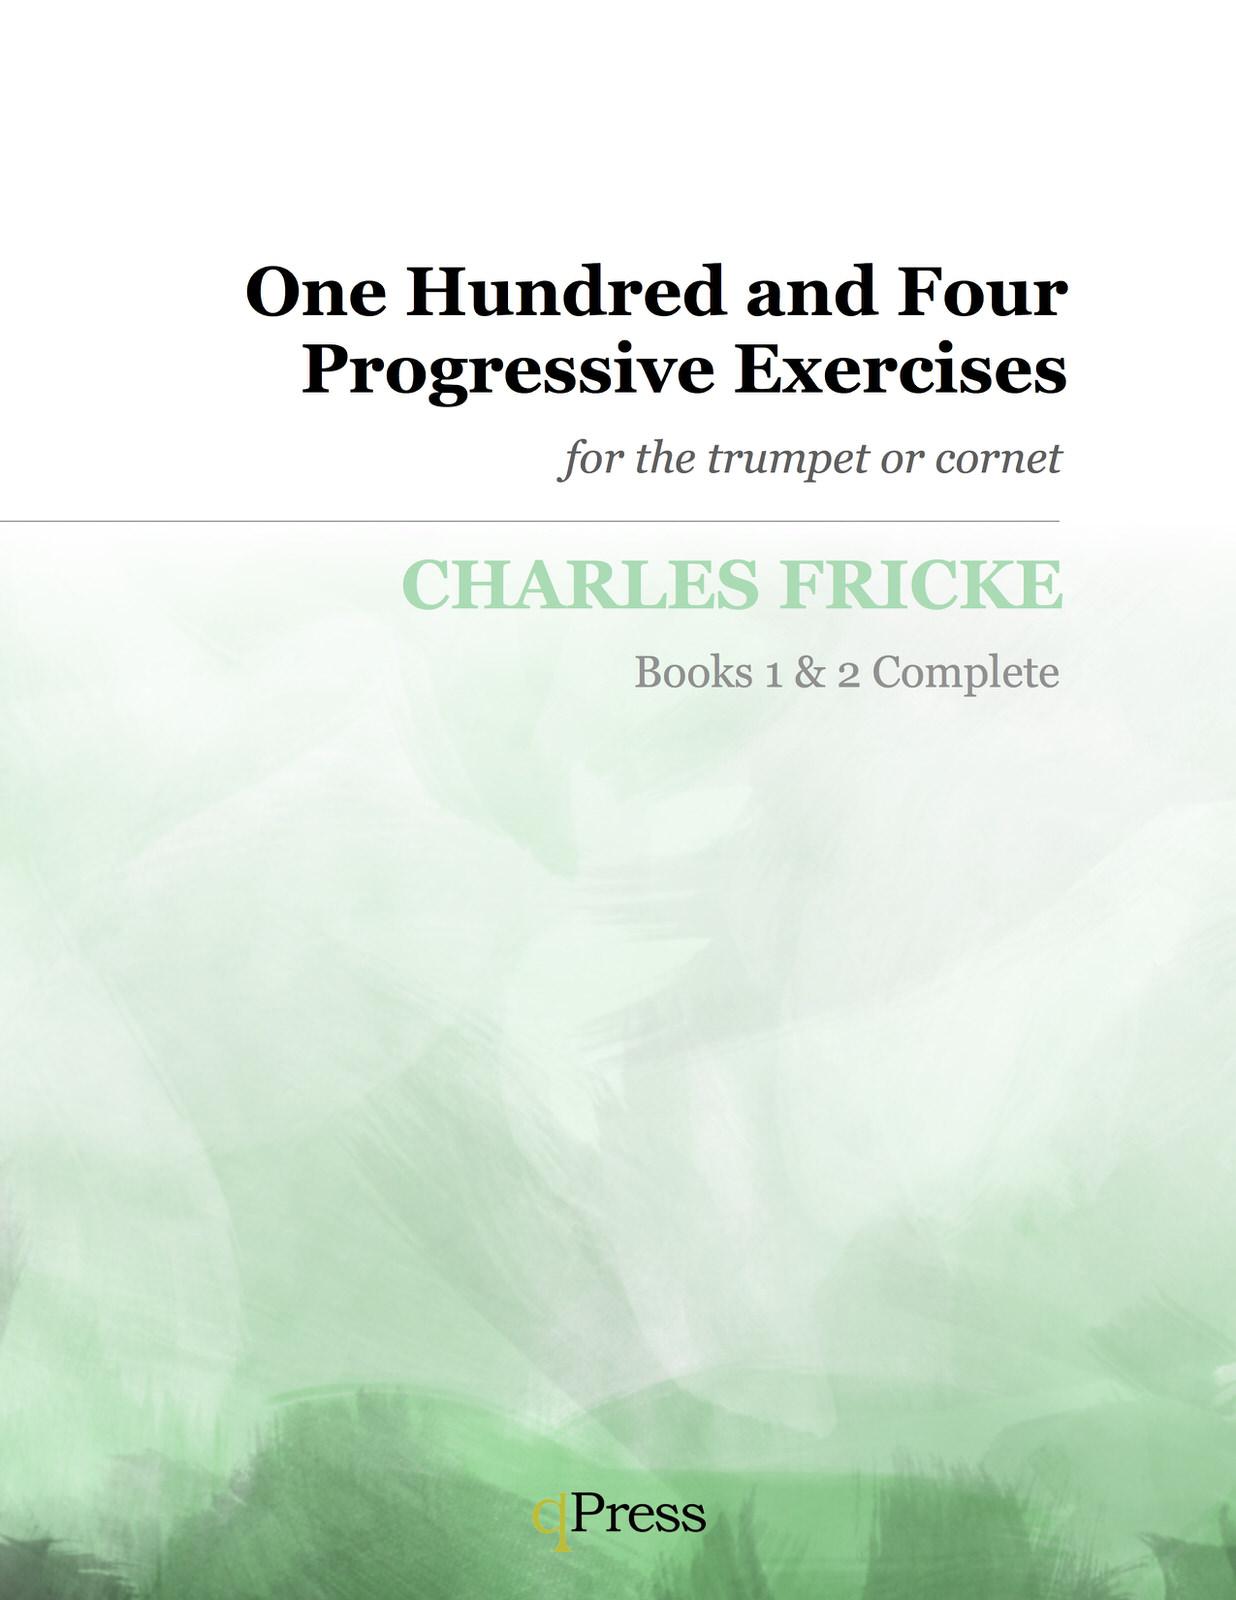 fricke-charles-104-progressive-exercises-for-wind-instruments